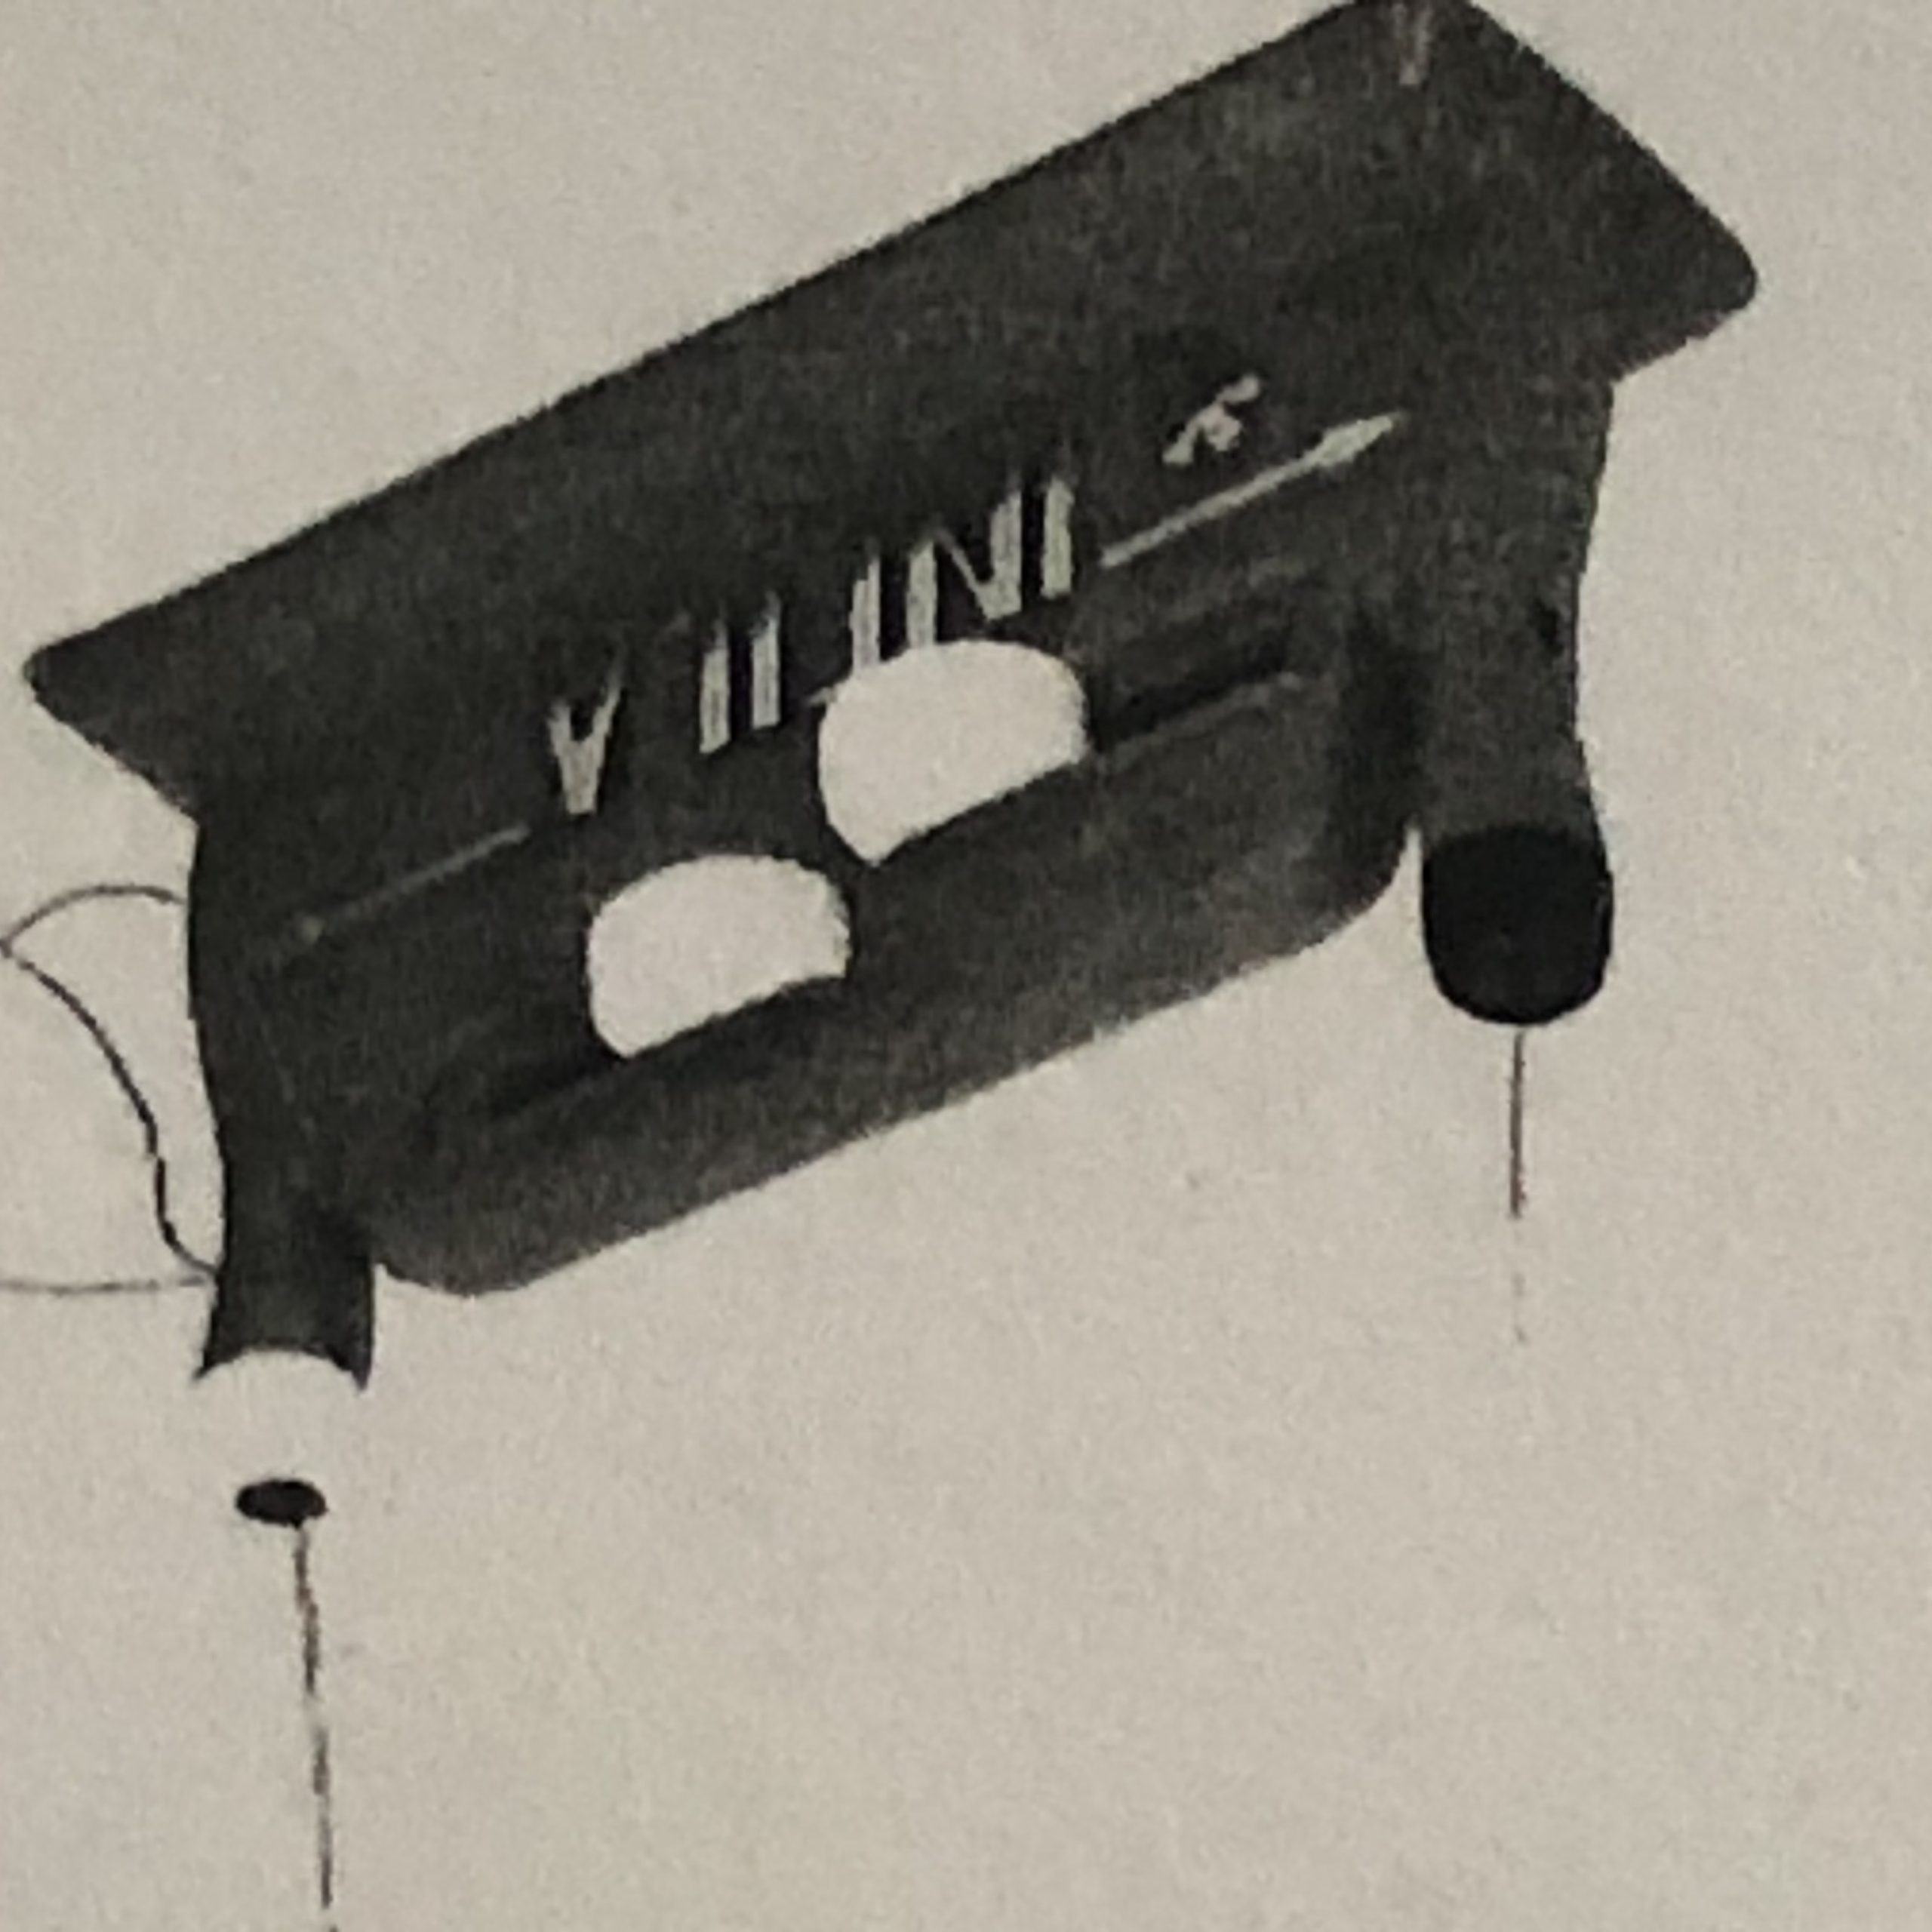 Stitch In Time - Needle Threader